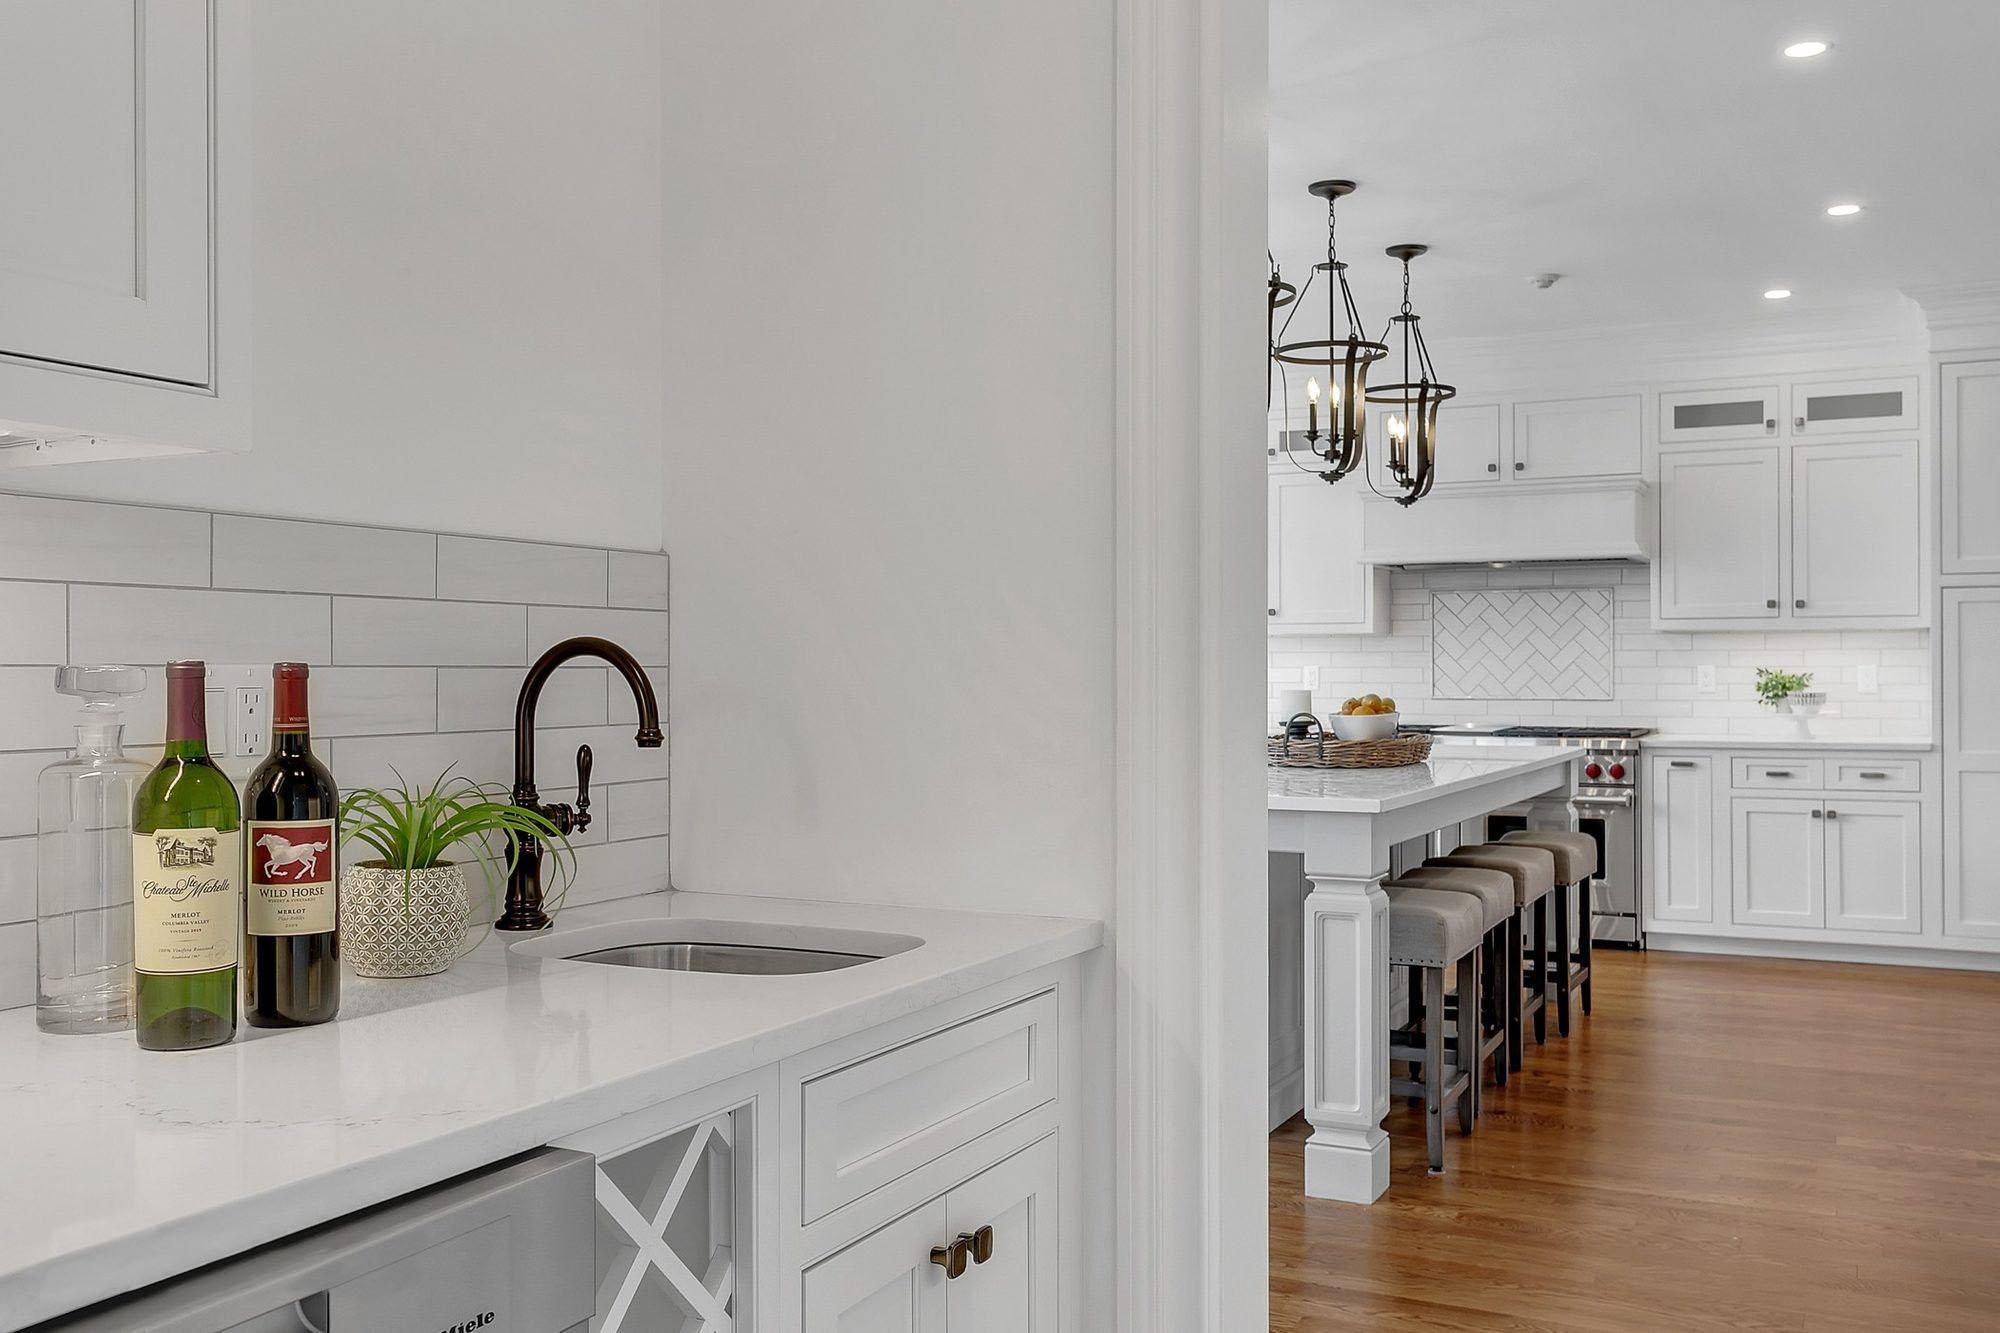 Prep kitchen with small sink, white countertops and white subway tile backsplash.